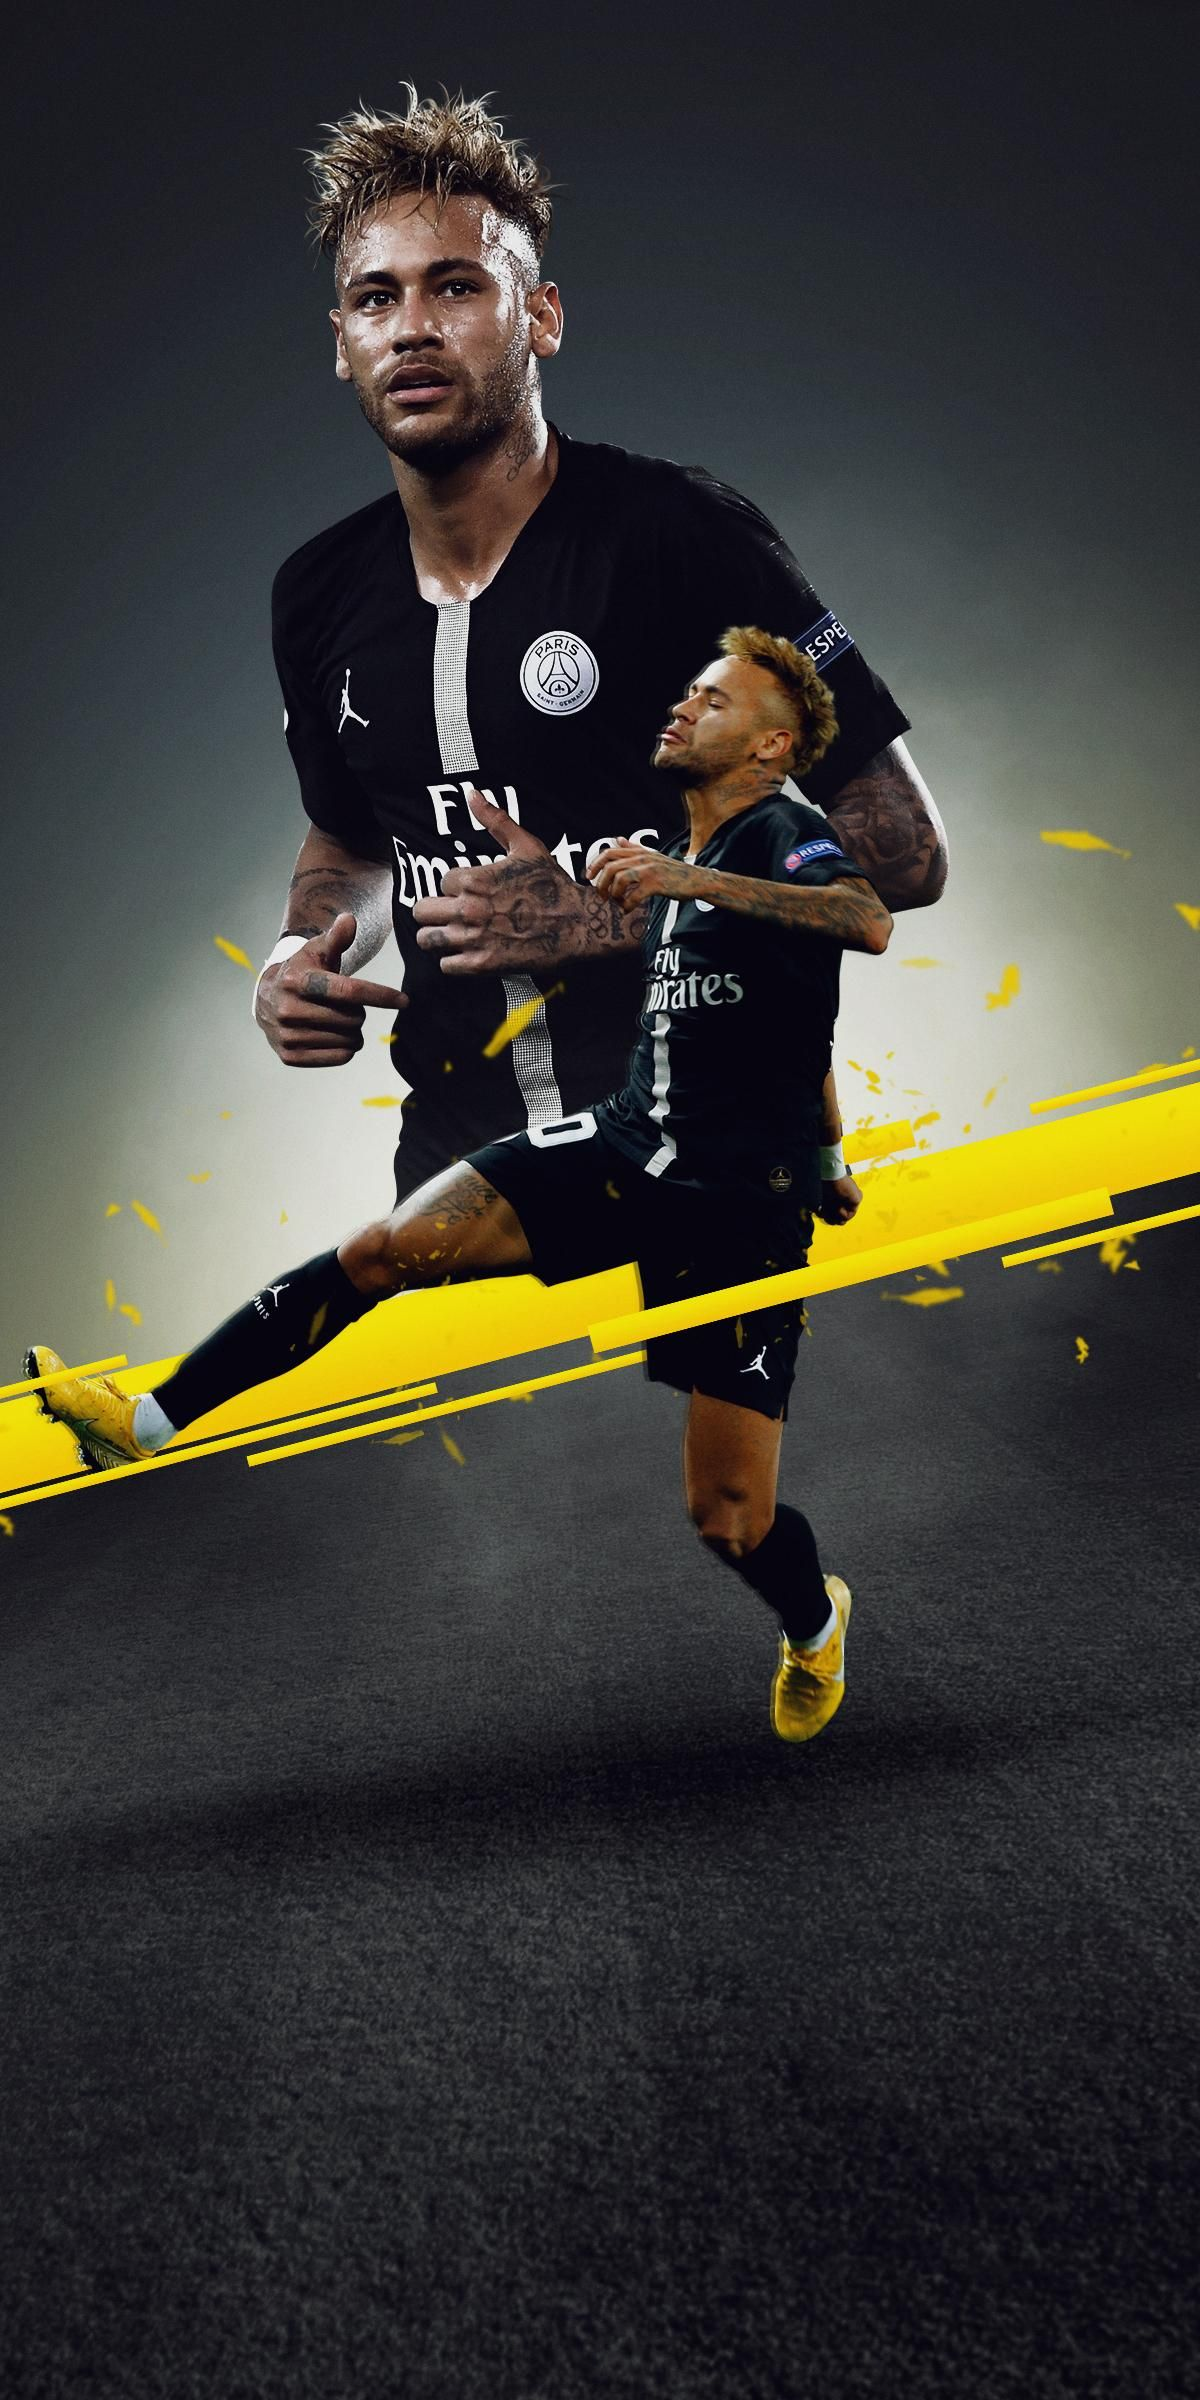 Pin de Sai Prem em Sports wallpapers Futebol neymar